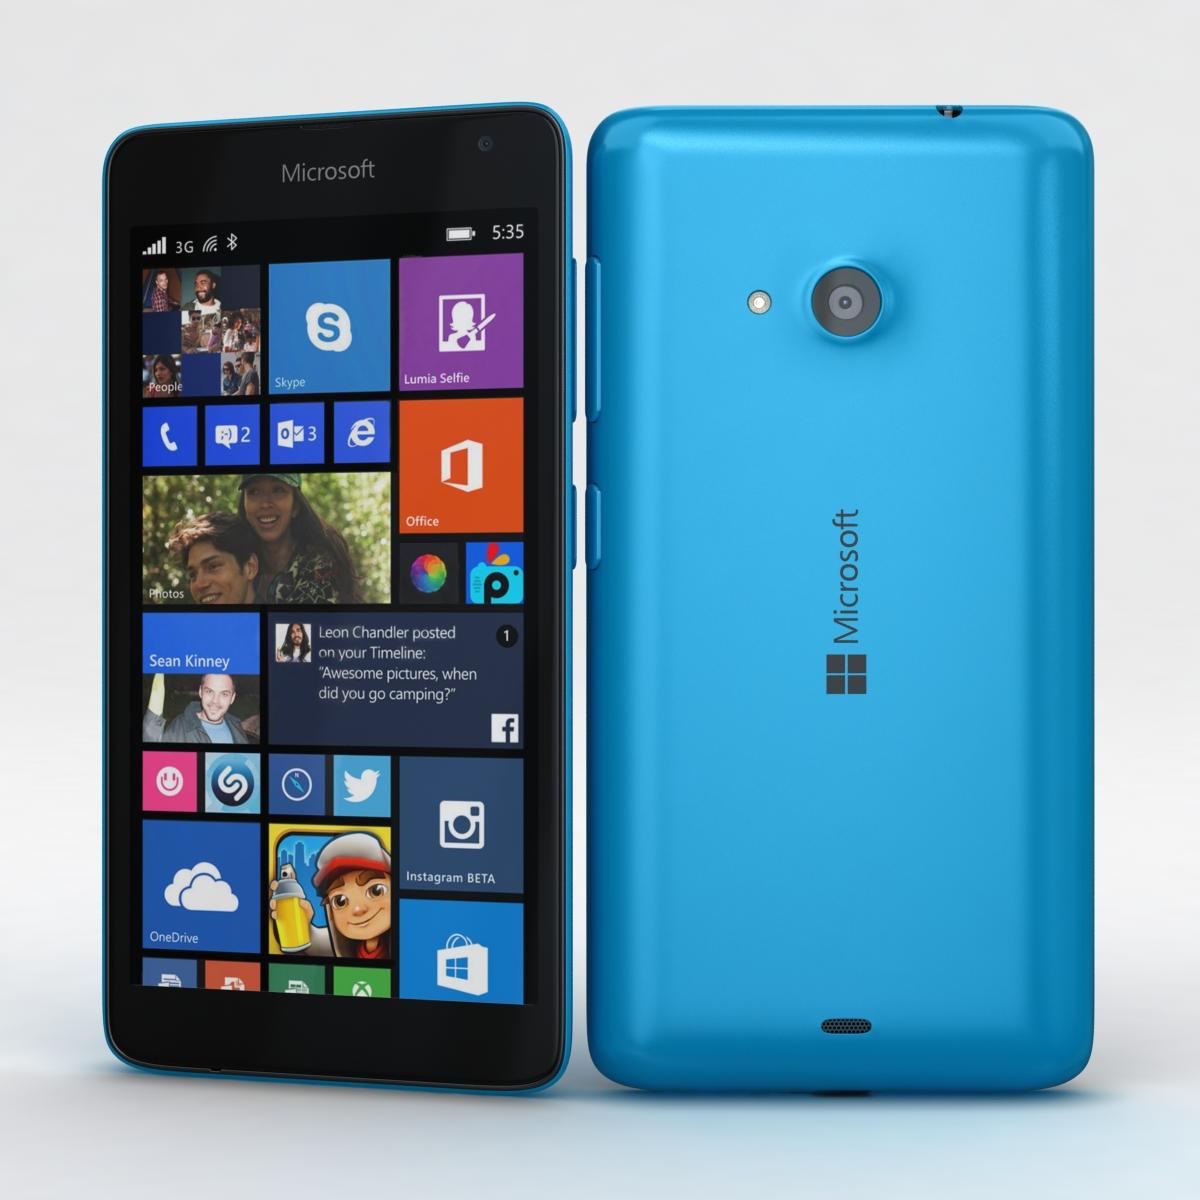 Microsoft Lumia 535 and Dual SIM Blue 3d model 3ds max fbx c4d obj 204522